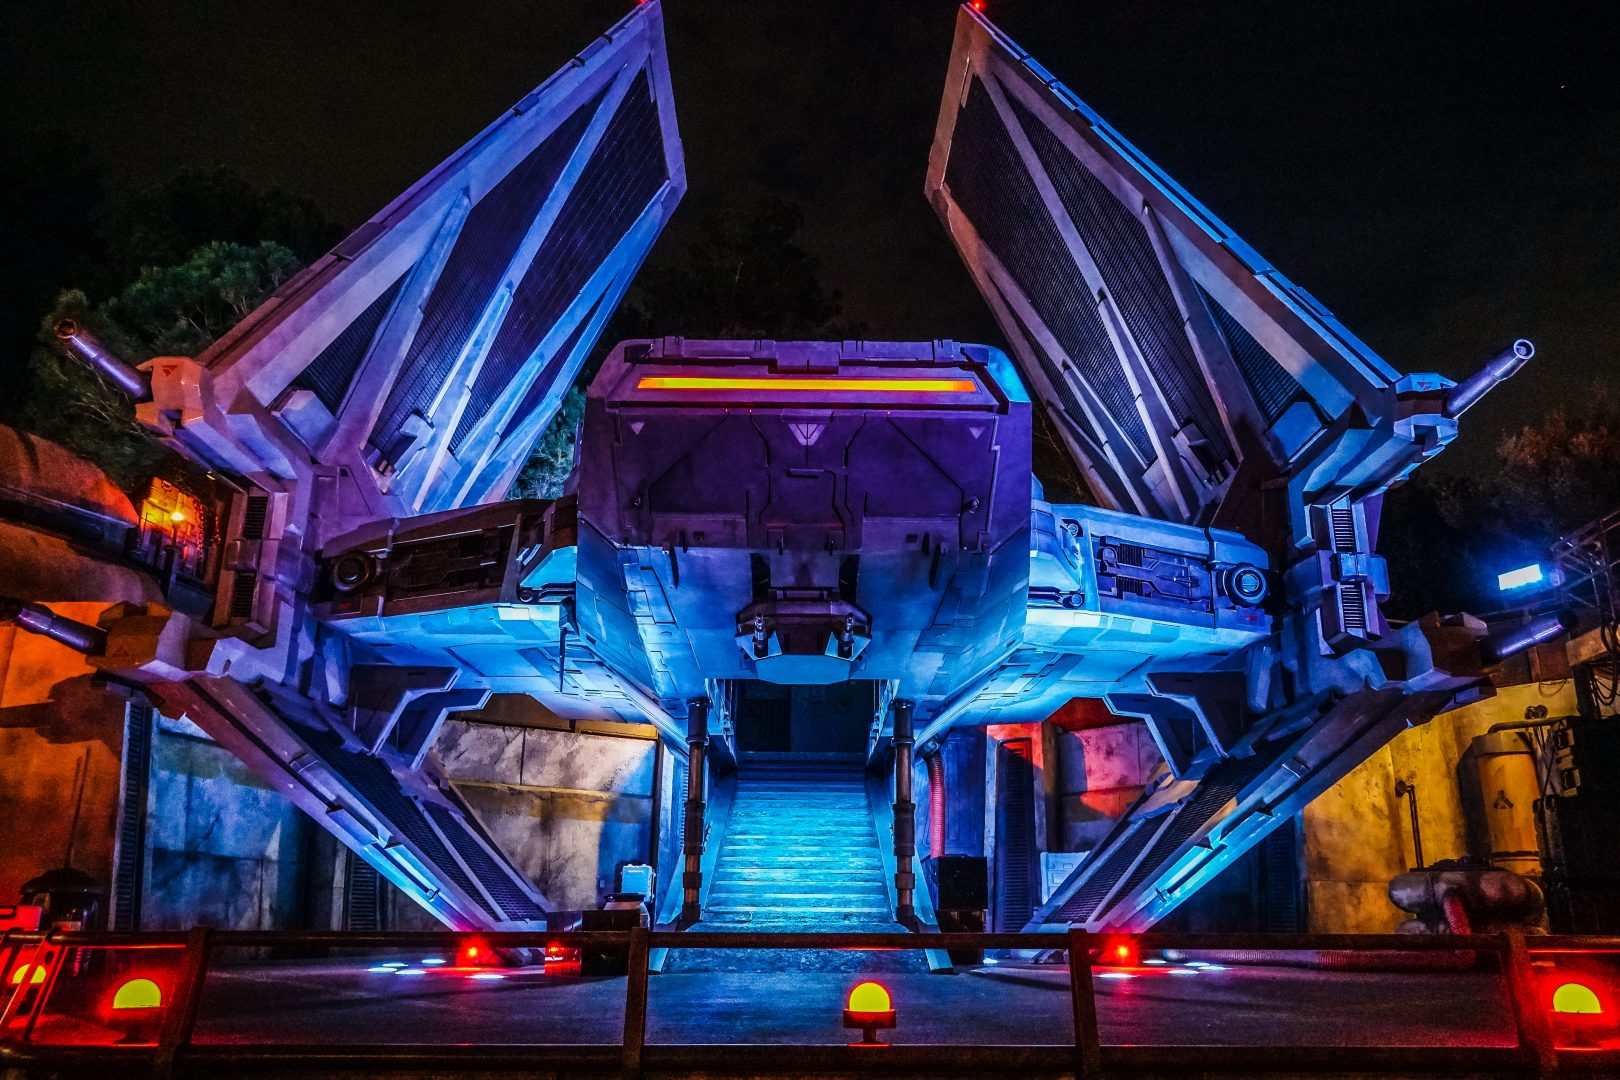 triangular plane lighted building